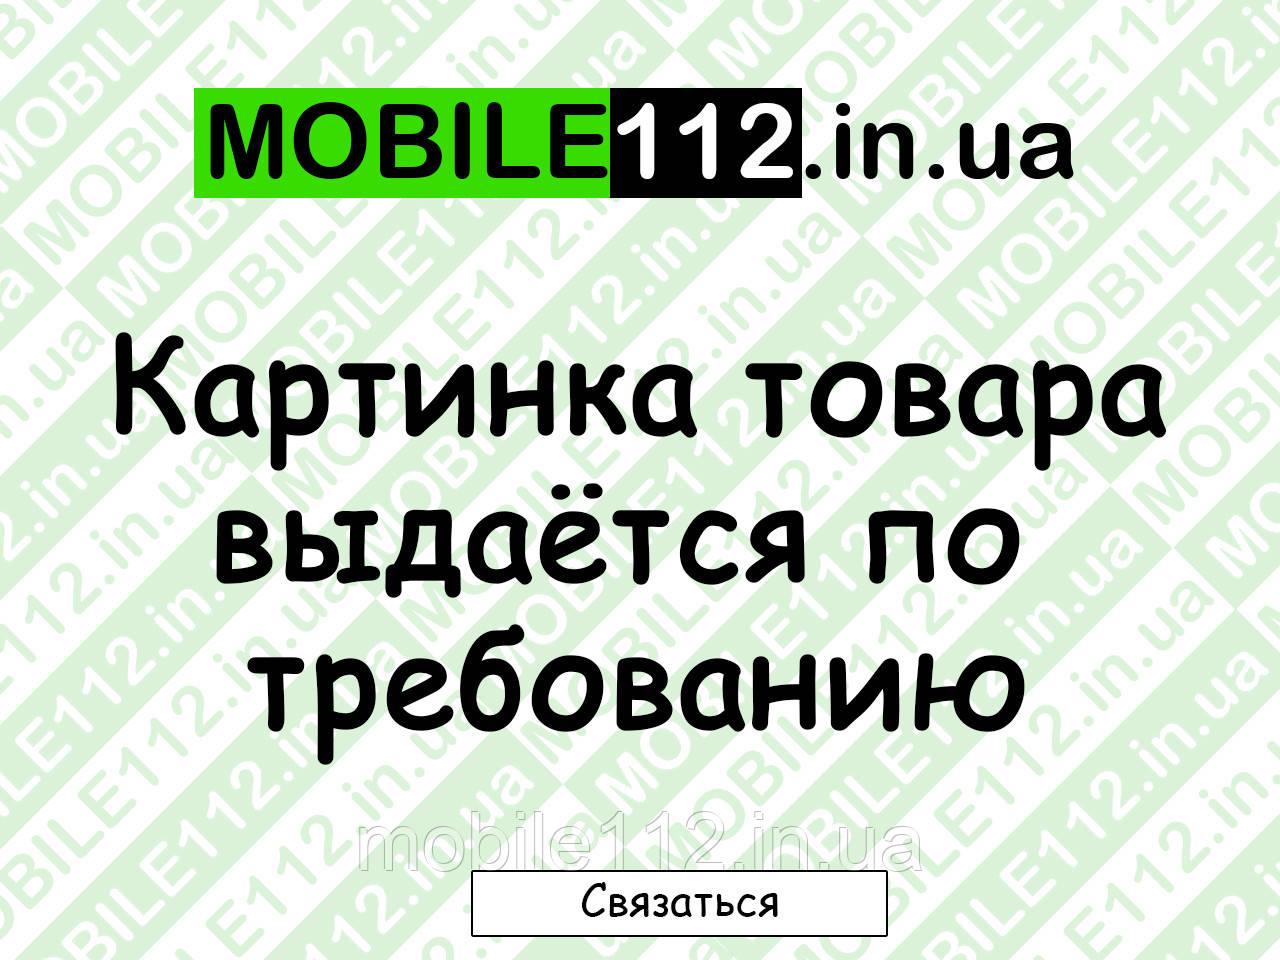 Дисплей для Blackberry 9800 + touchscreen, чёрный